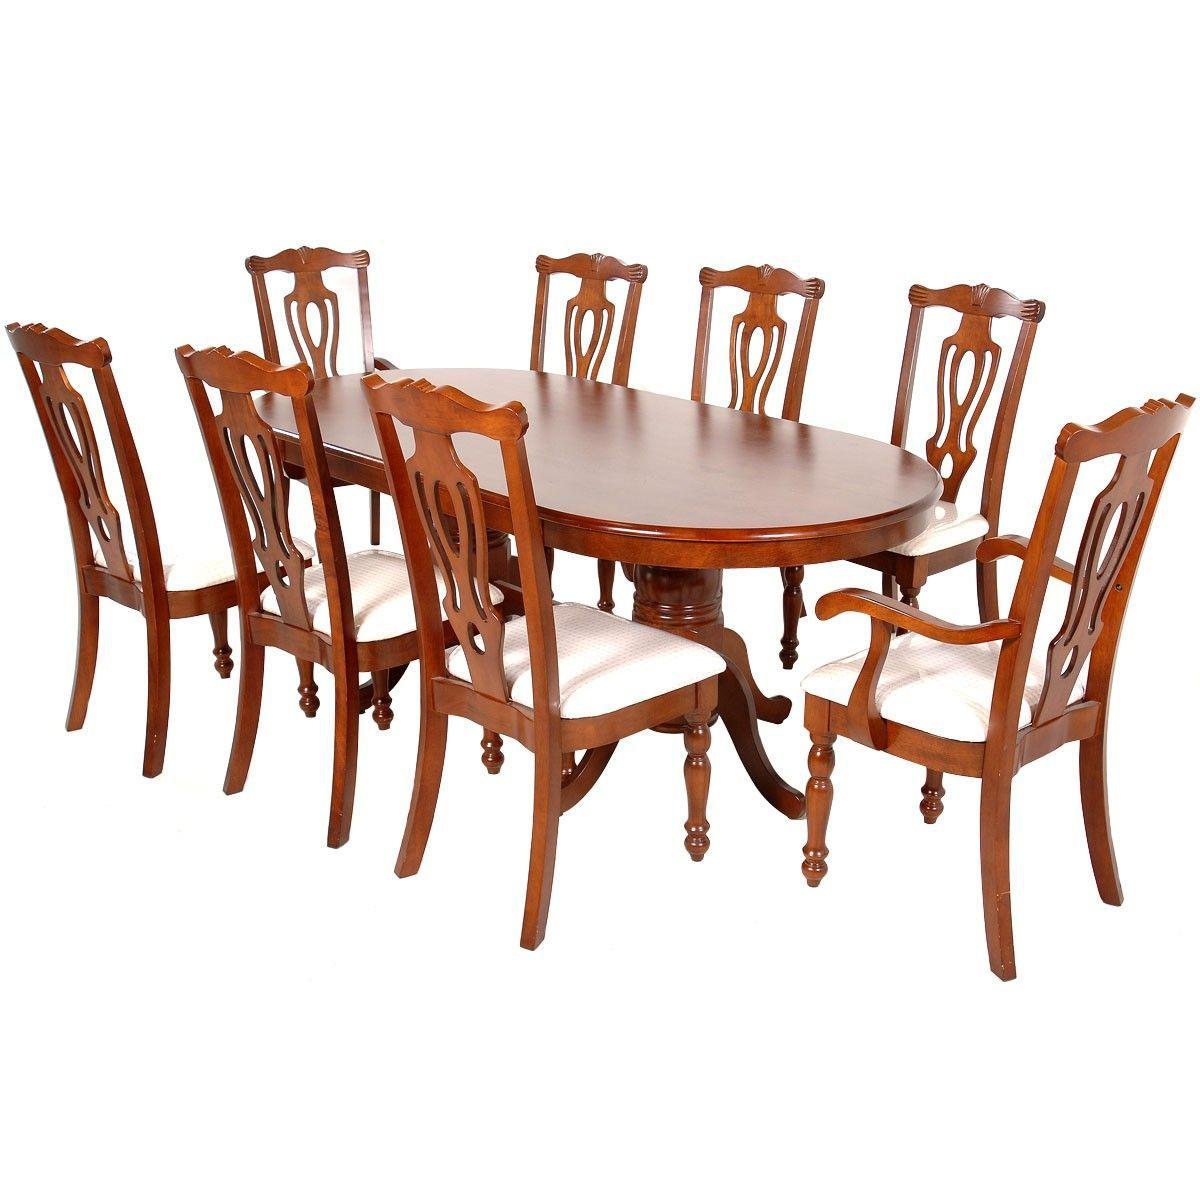 commodity juego de comedor zoysia 8 sillas sillas